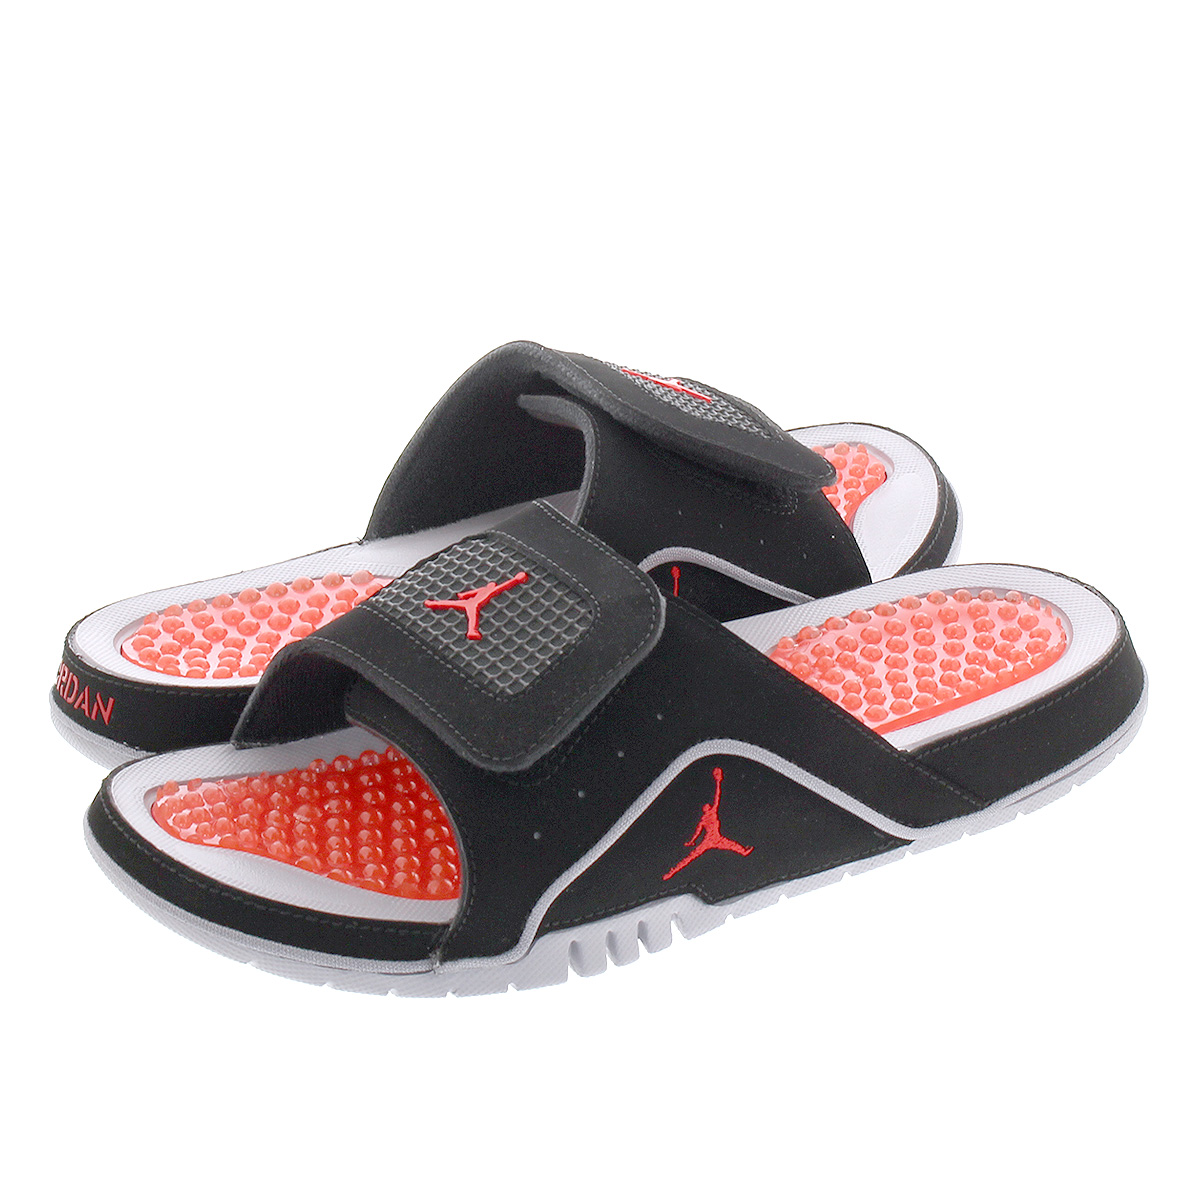 c8fb2be4ccda2e NIKE JORDAN HYDRO IV RETRO Nike Jordan high mud 4 nostalgic BLACK FIRE  RED CEMENT GREY 532